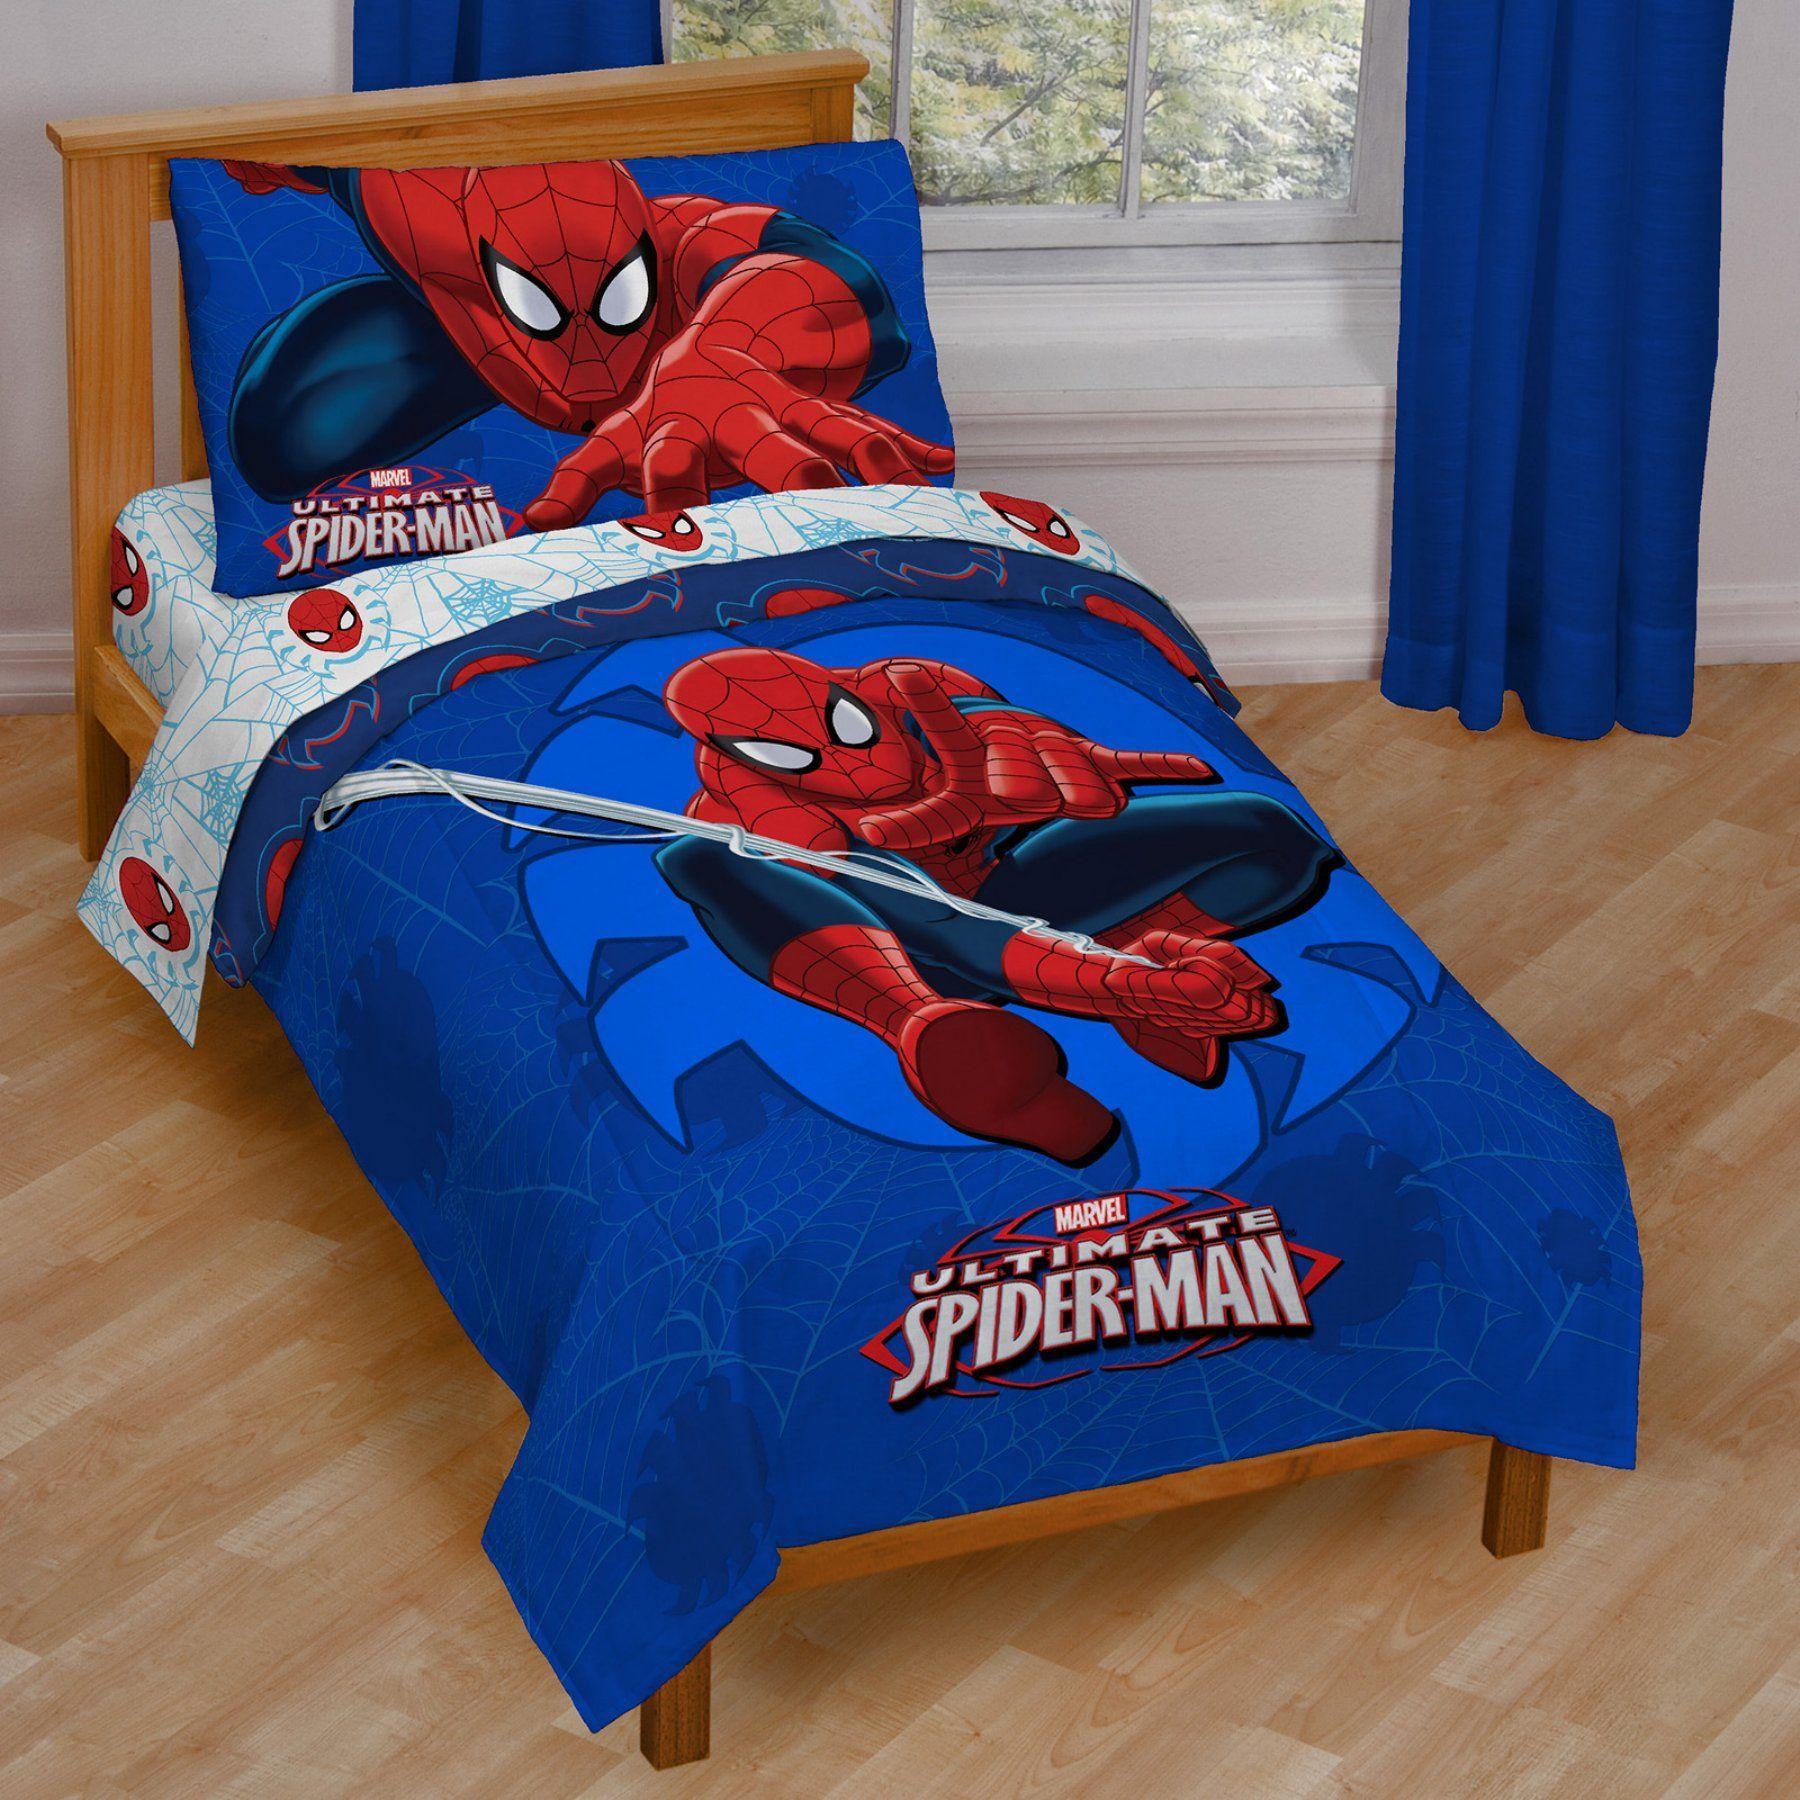 Spiderman Regulator Toddler Bed Set By Marvel Jf28946hyml